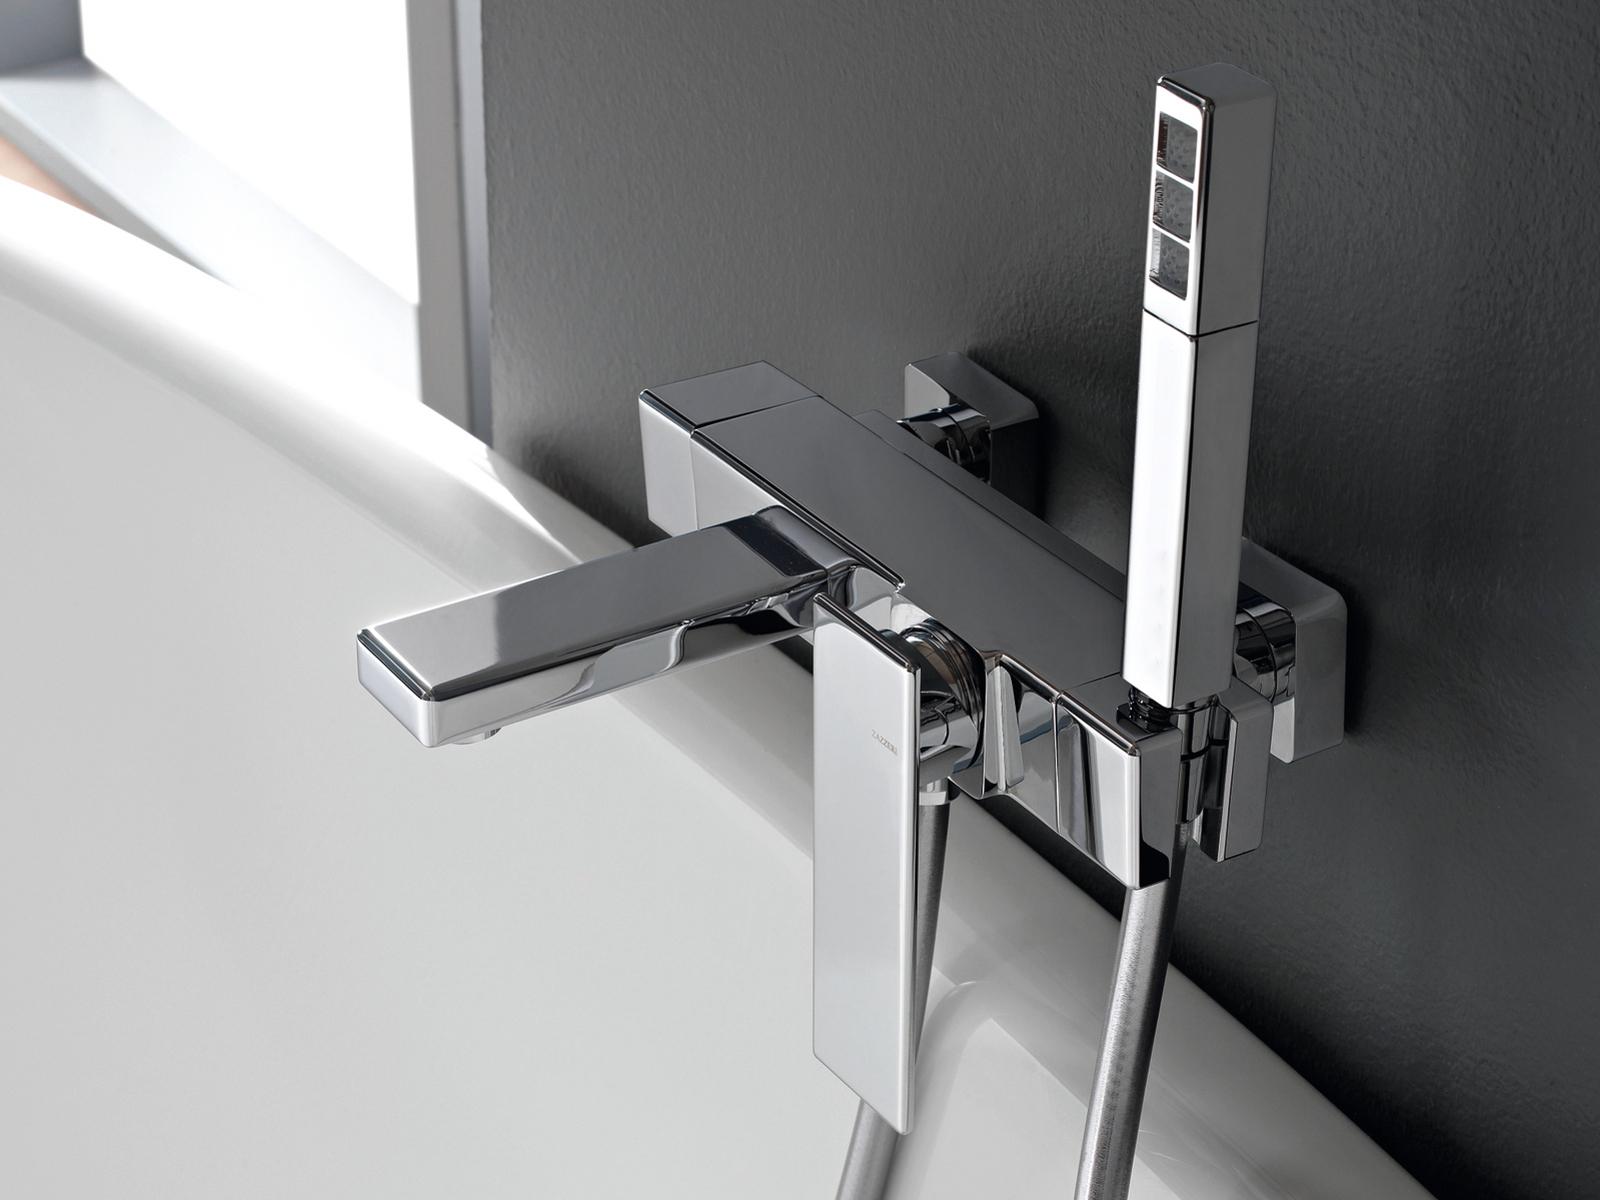 Miscelatore Vasca Da Bagno : Toscano miscelatore vasca zazzari rubinetteria da bagno